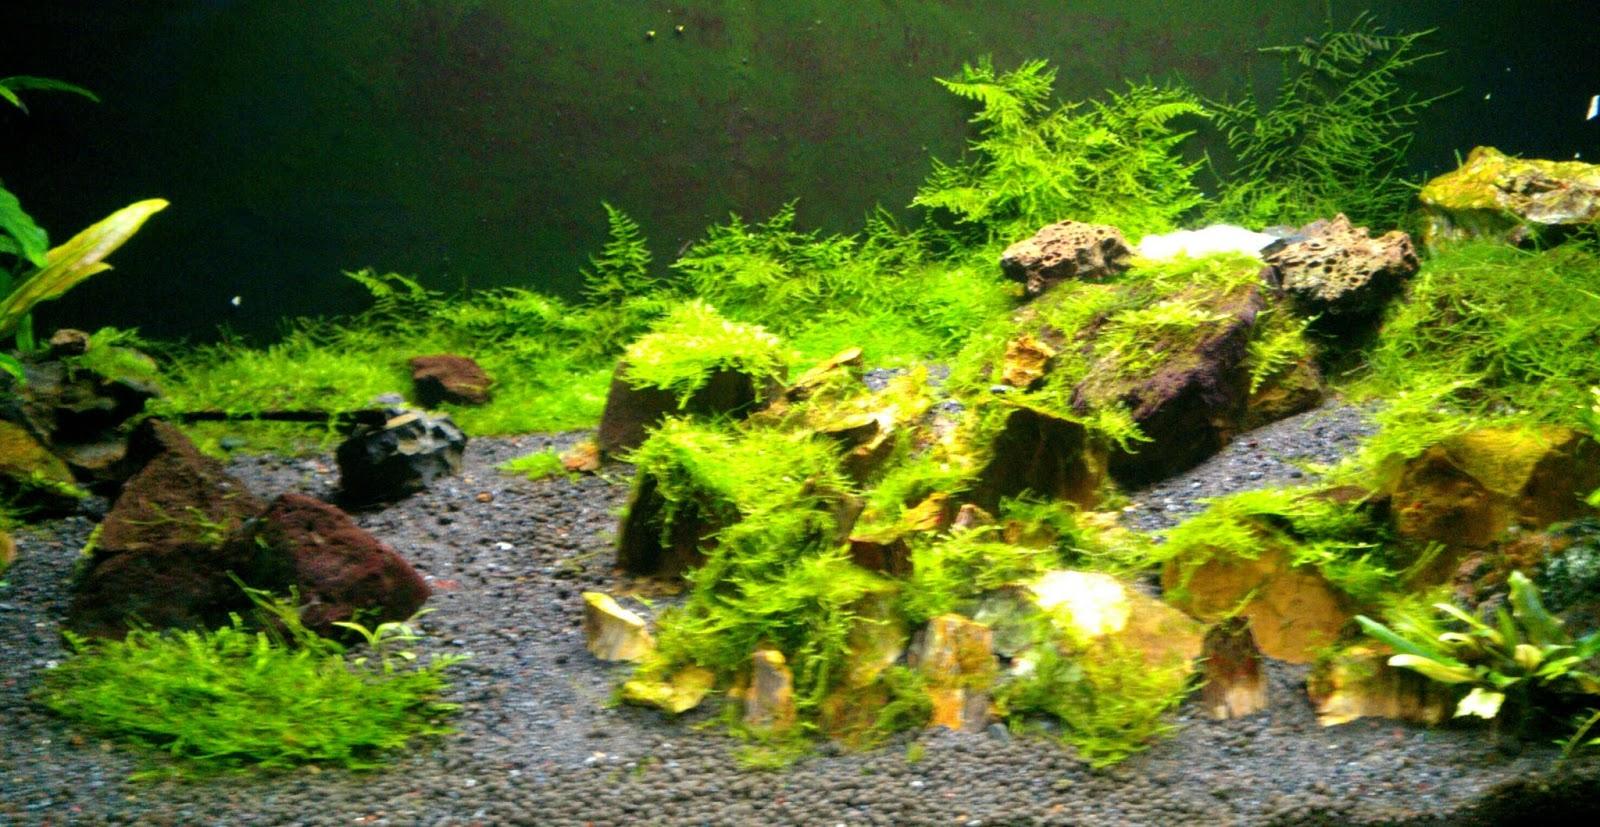 Greenleaf Splindid Aquascape Christmas N Mini Christmas Moss